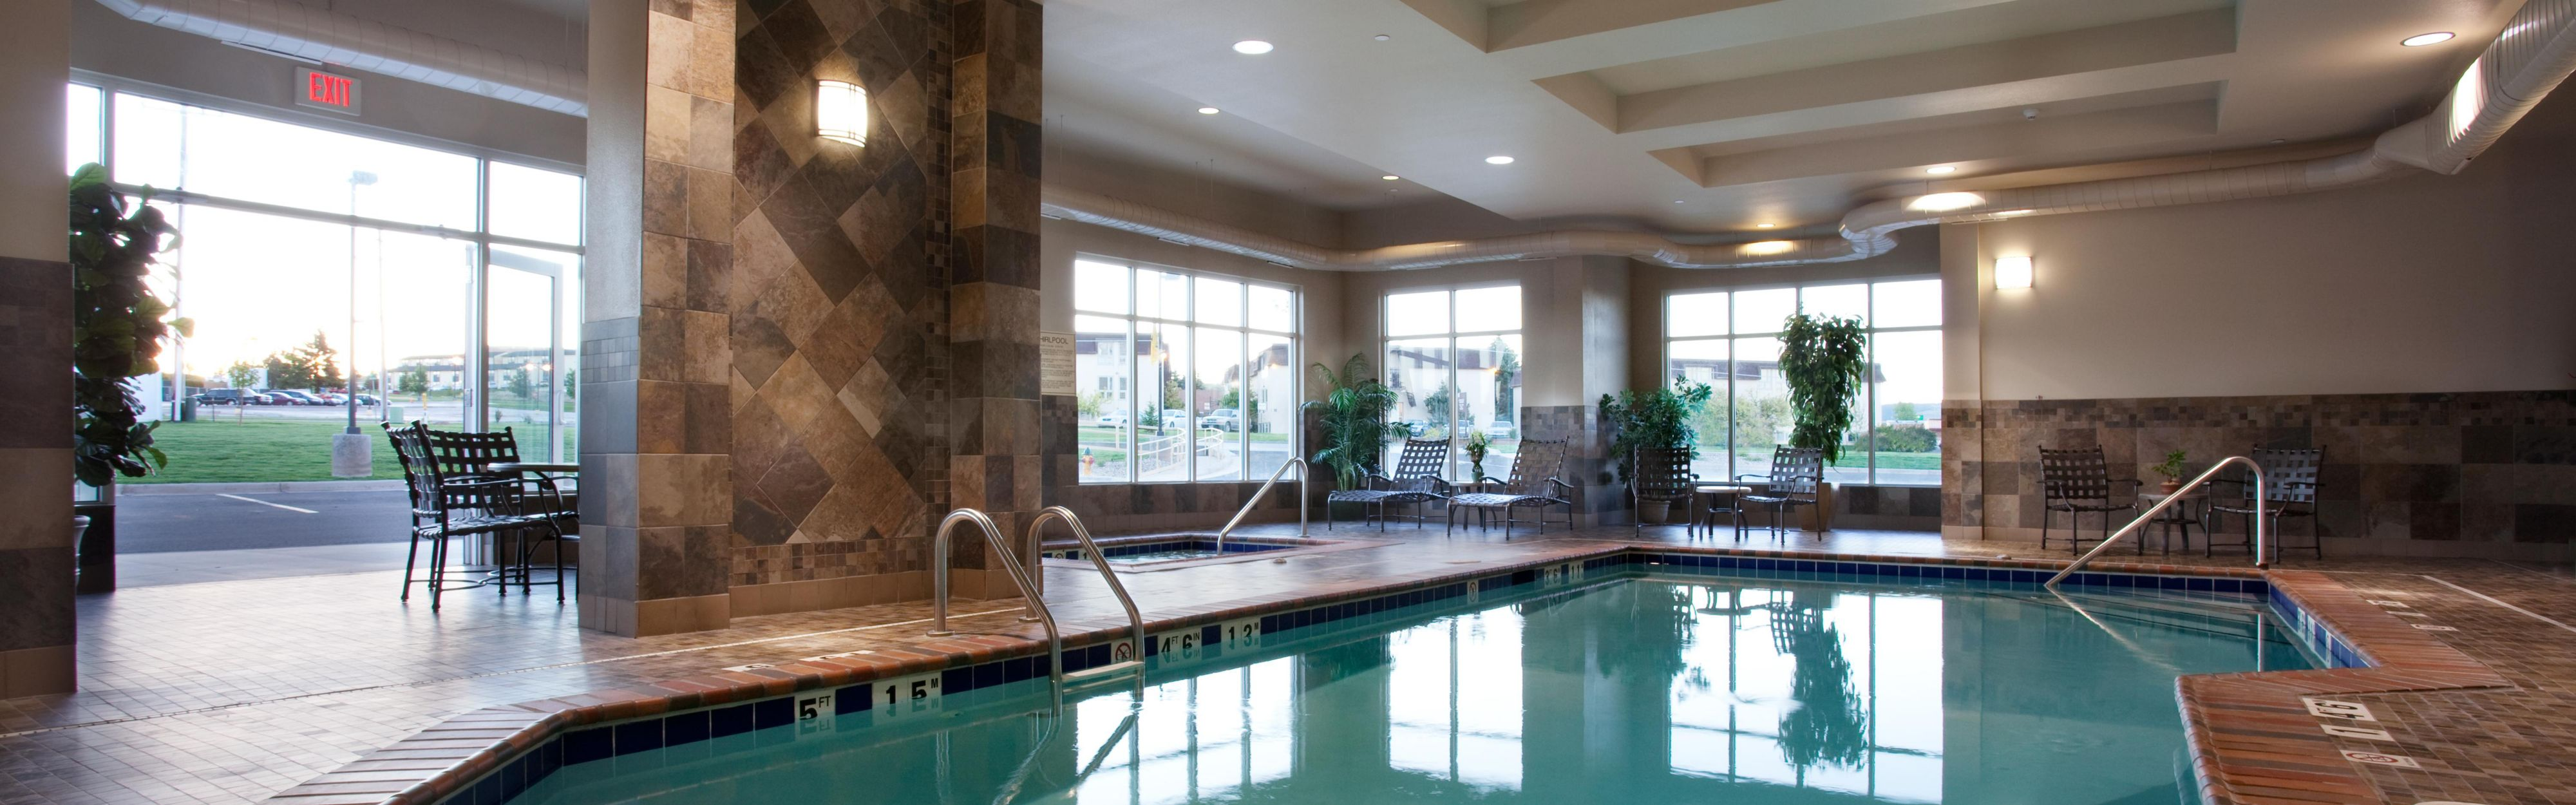 Holiday Inn Laramie image 2